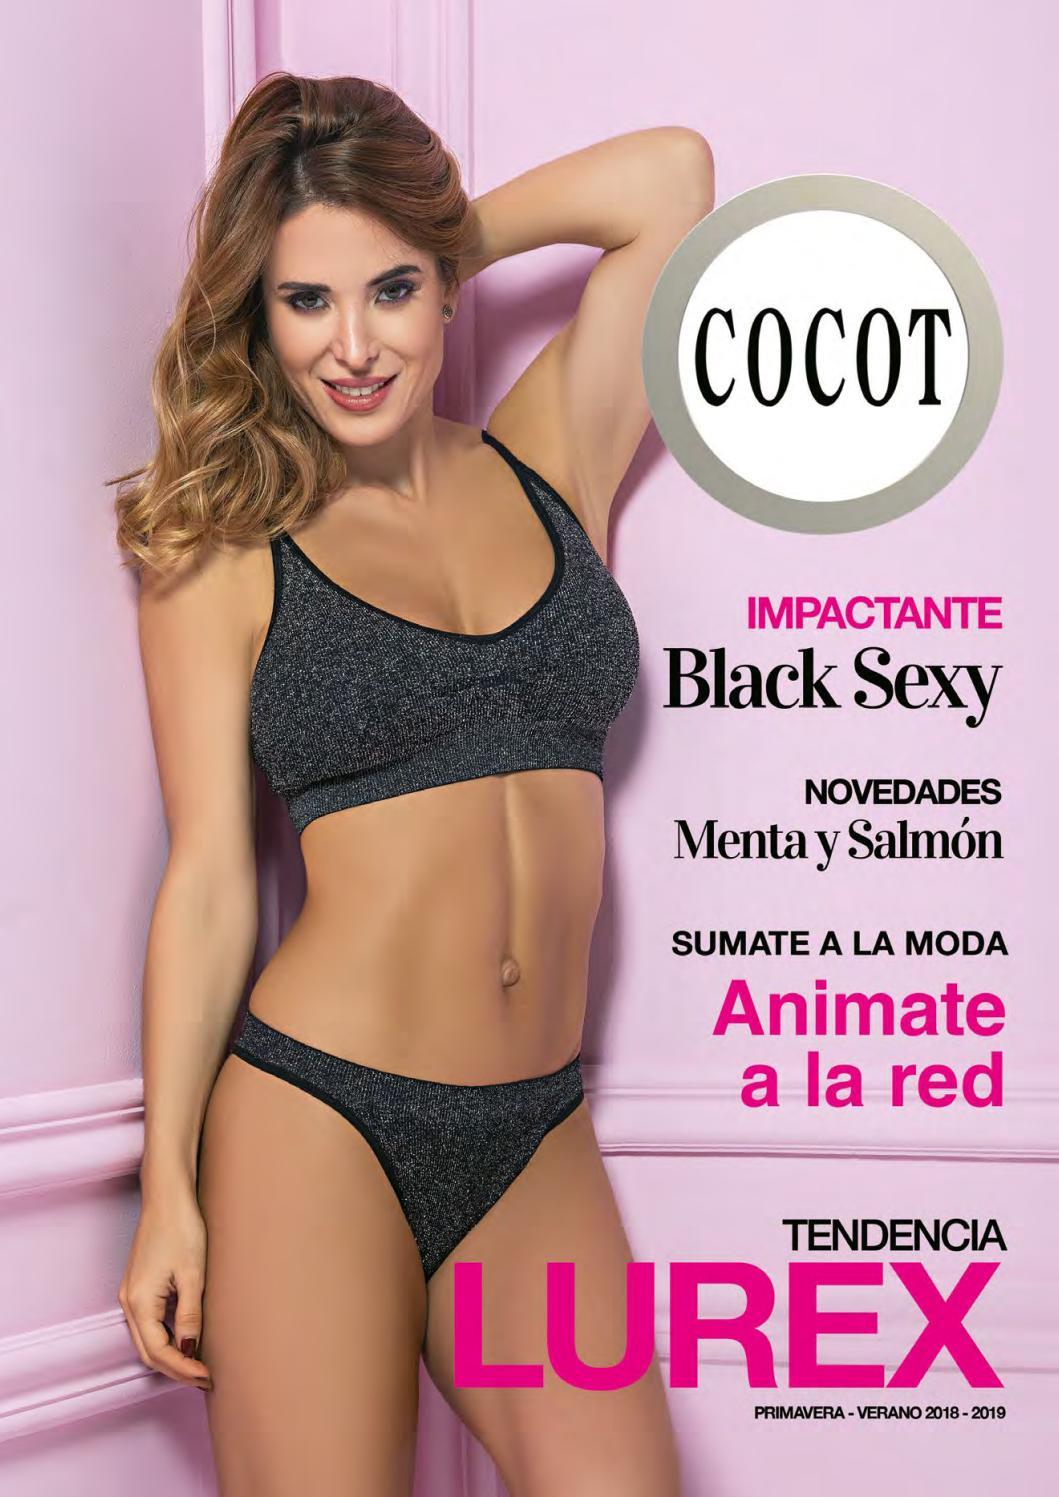 e20b635b4be0 cocot lenceria by al dia deportes - issuu